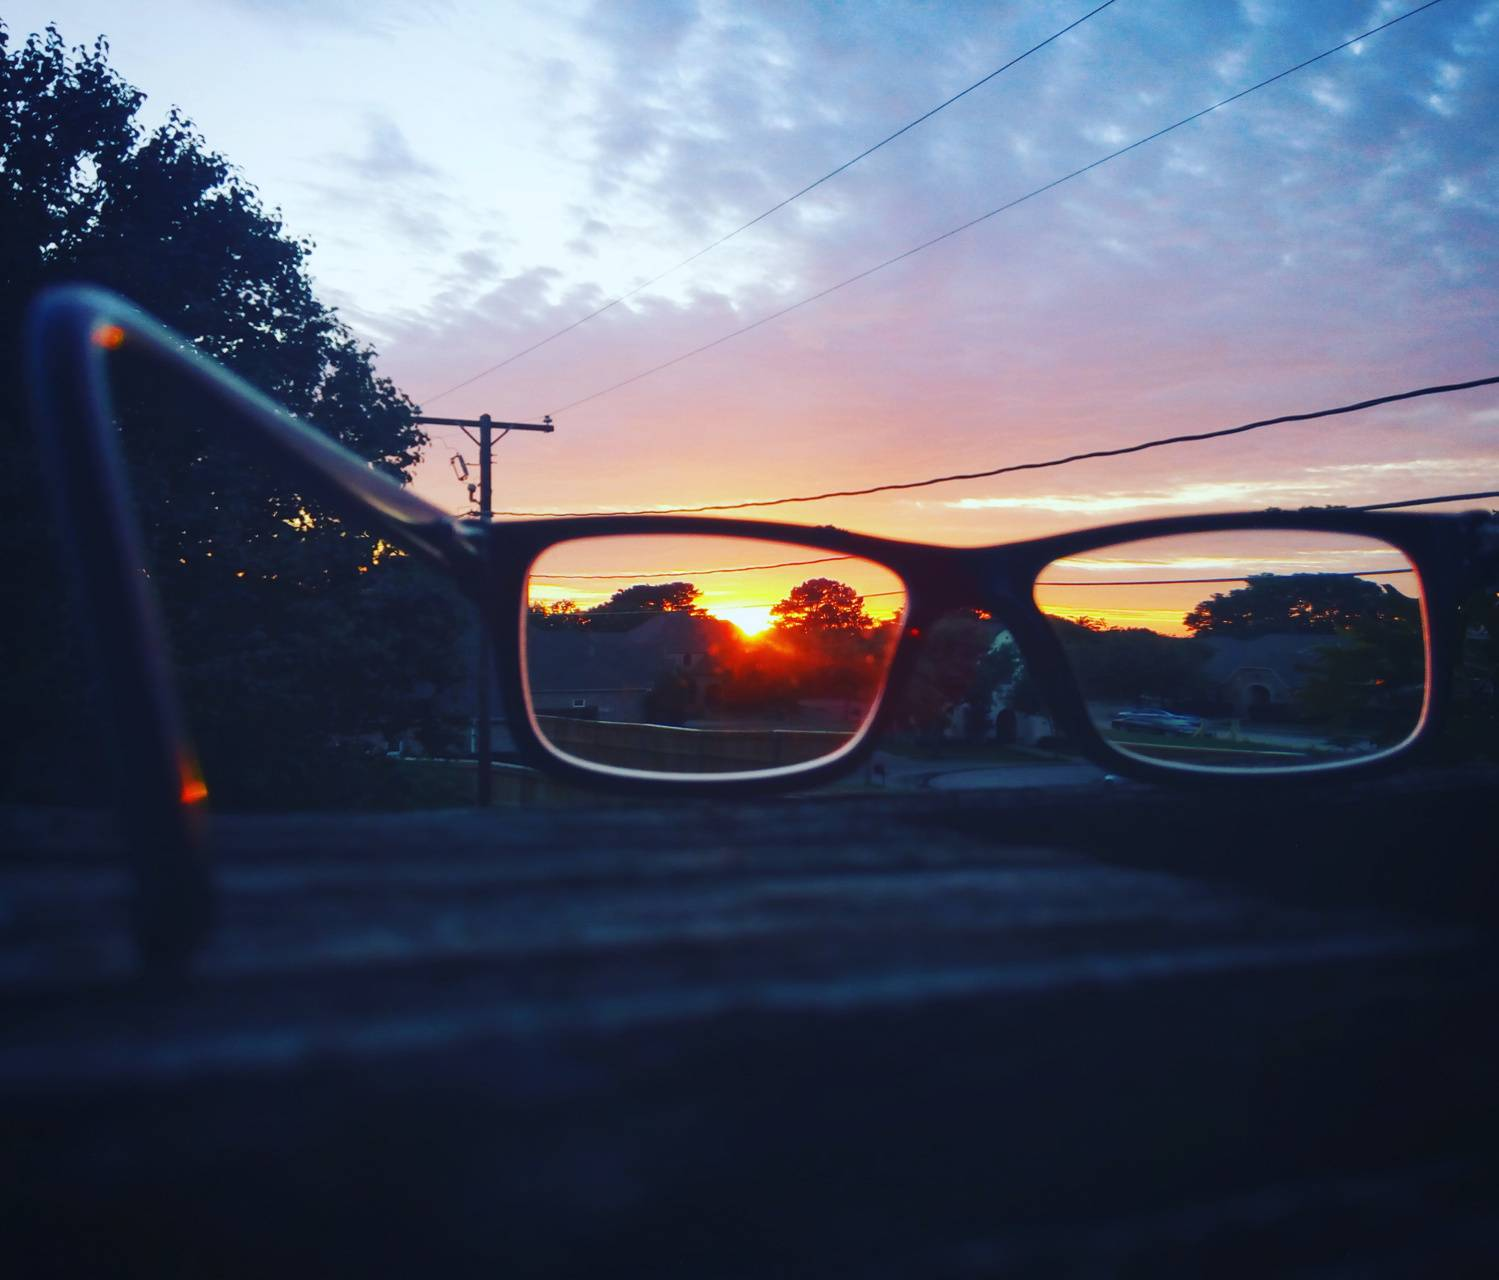 Sunset thru glasses